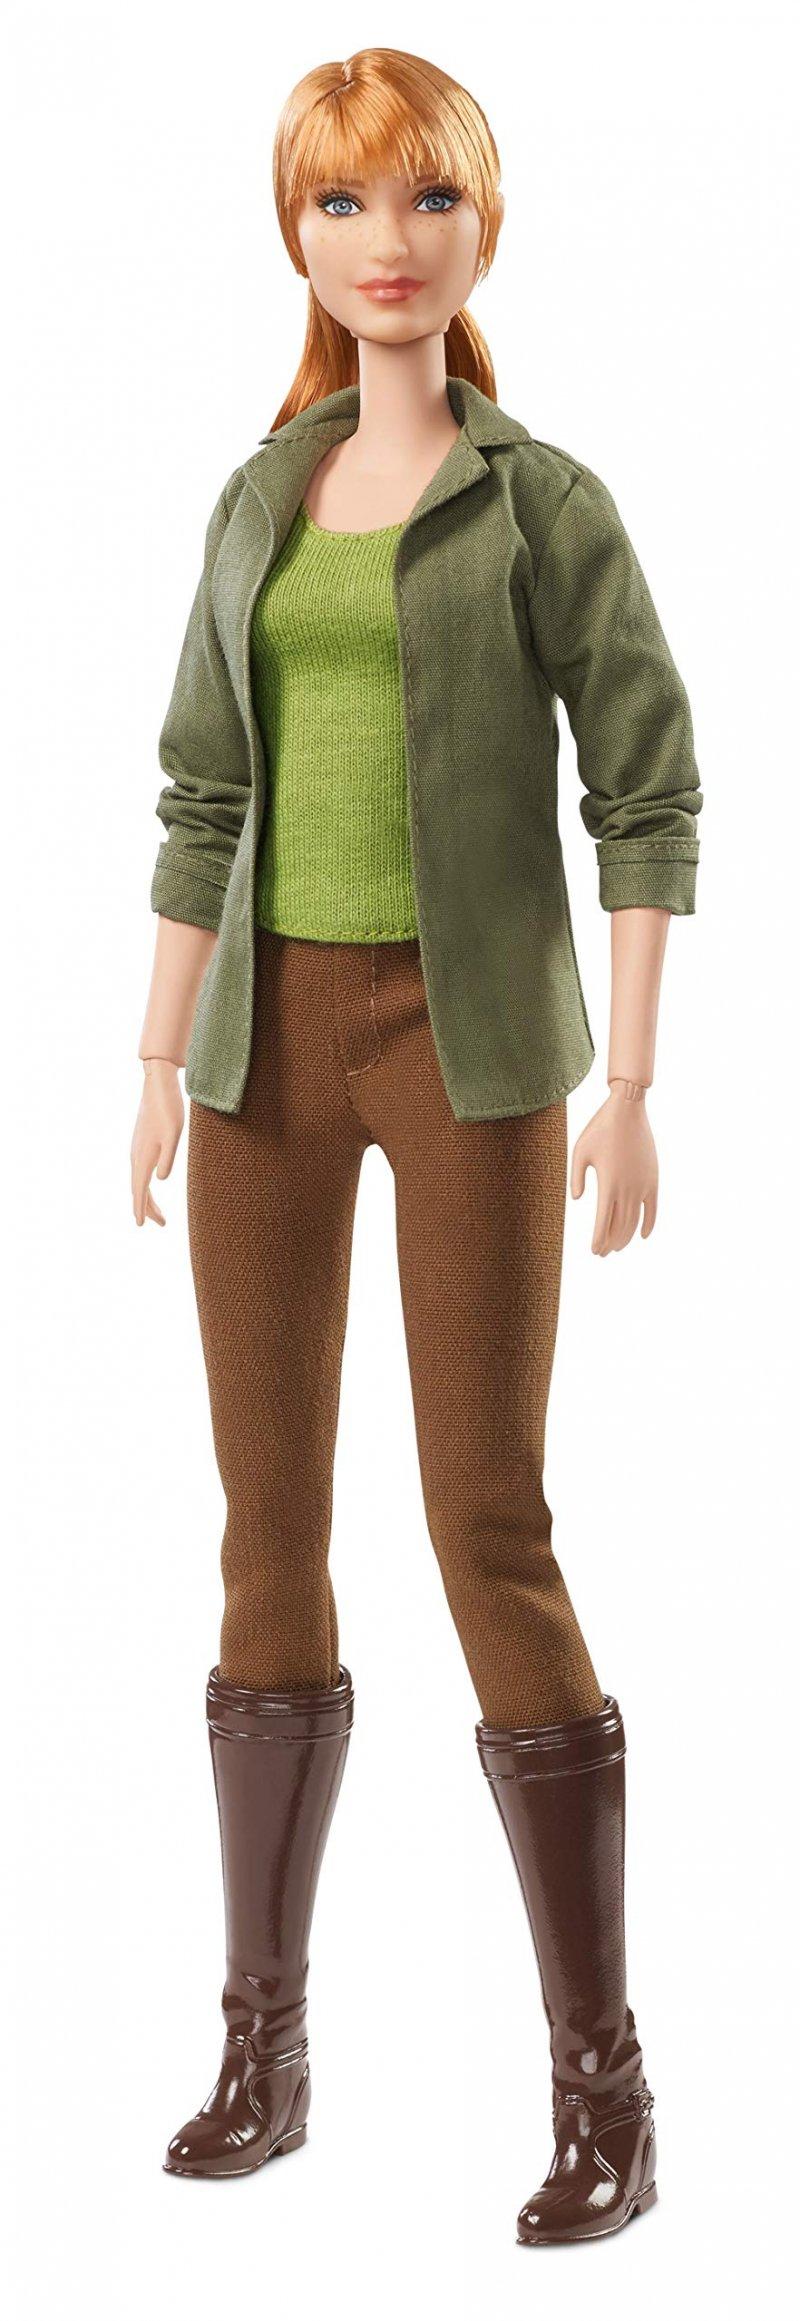 Image of   Barbie Dukke - Jurassic World - Claire Dukke